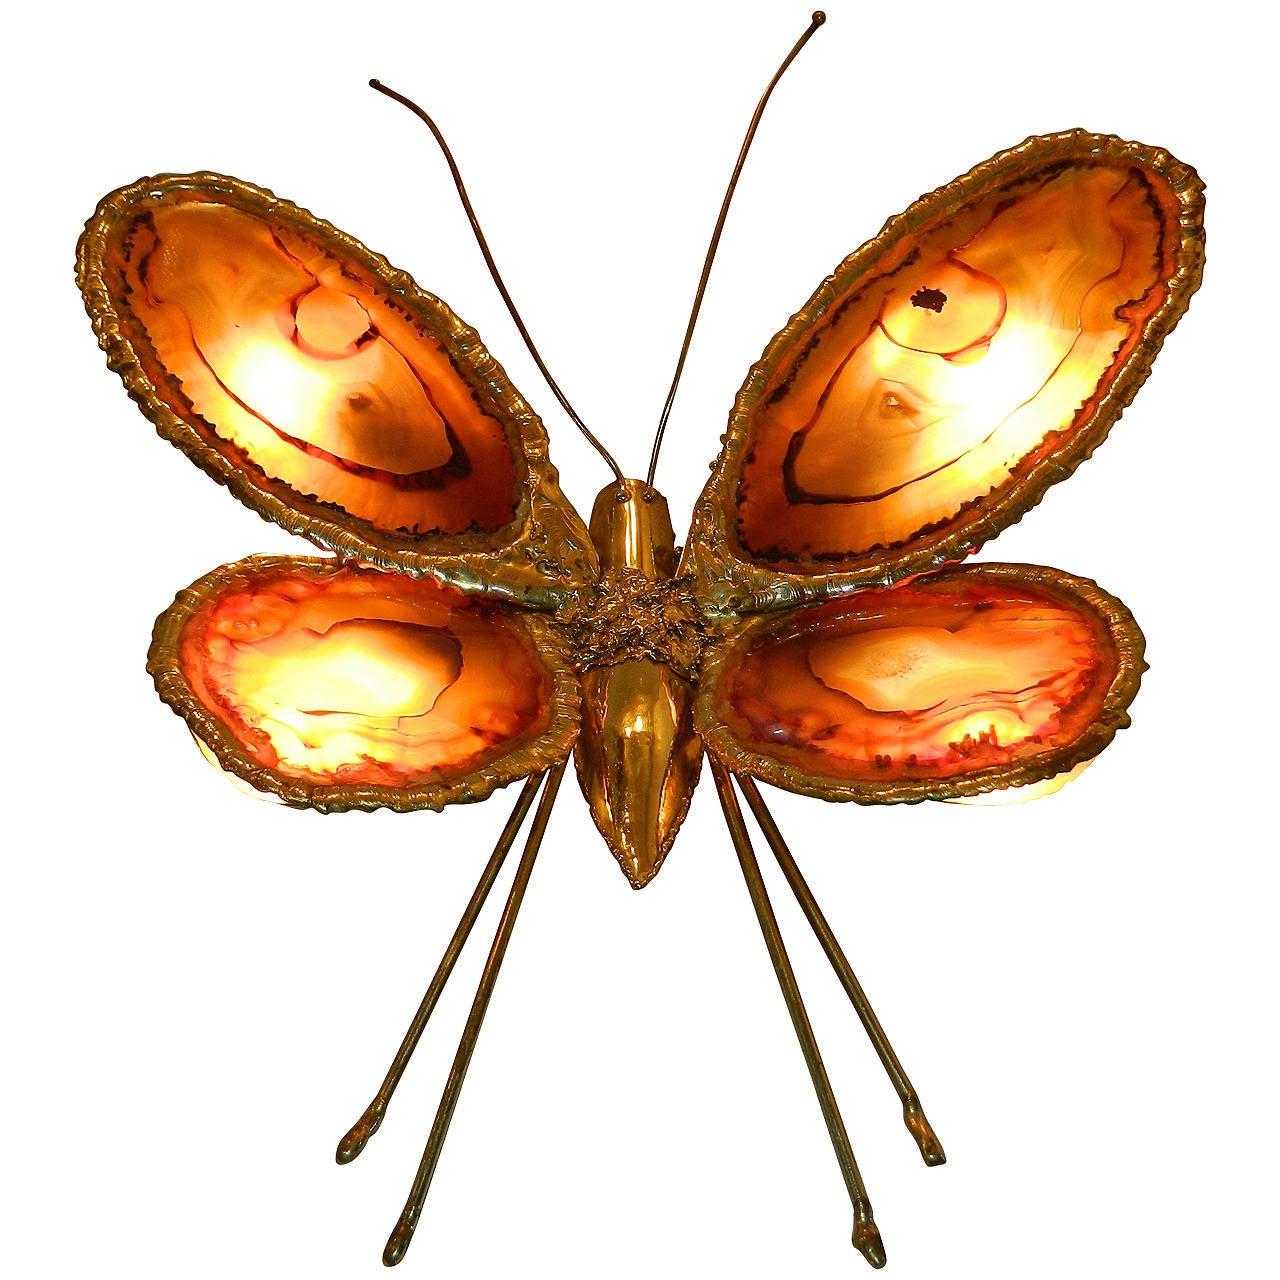 Duval-Brasseur Butterfly Sconce, France